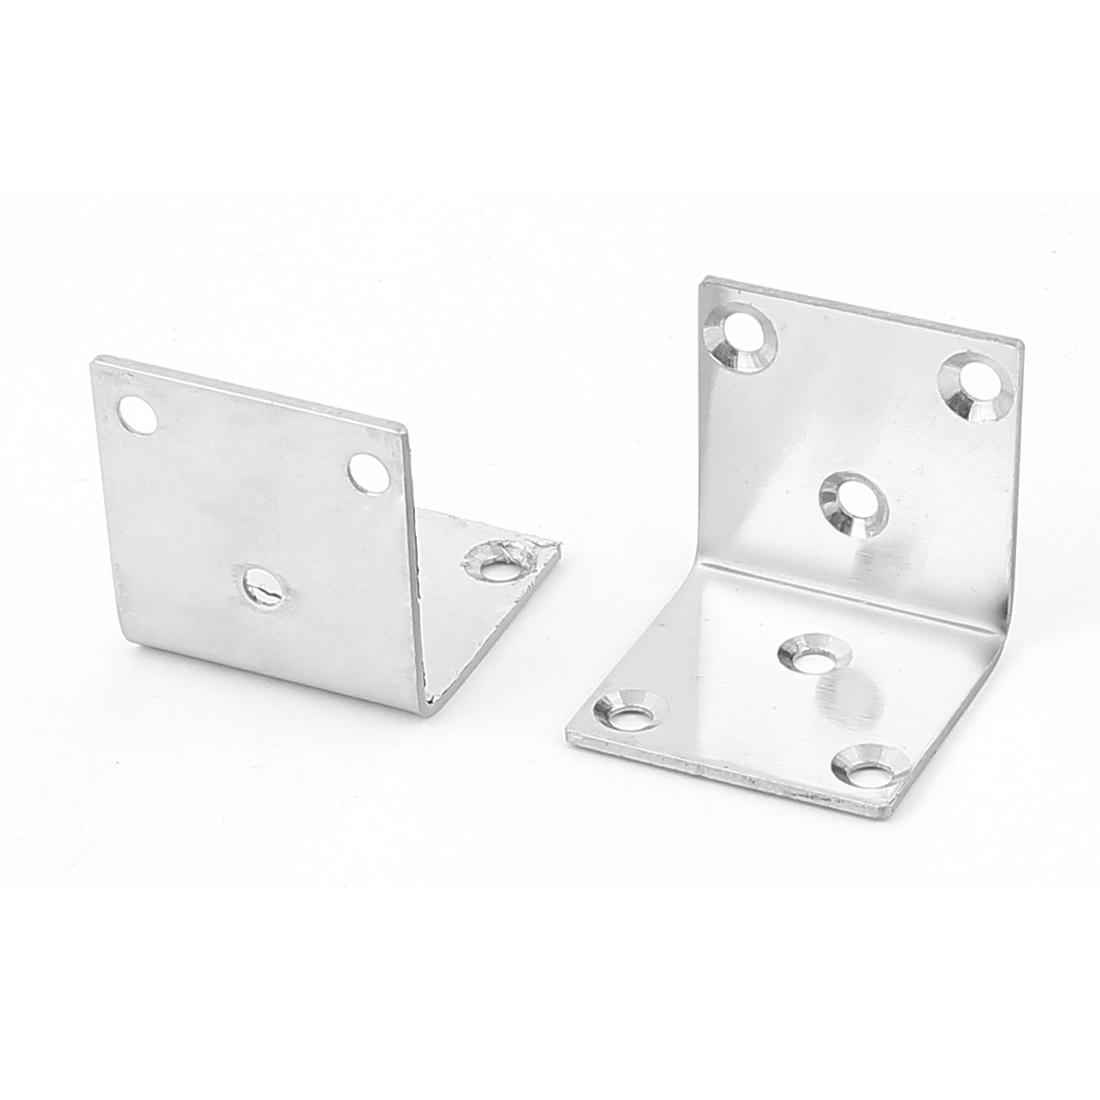 42mmx42mmx41mm Shelf Support Corner Brace Joint Metal Right Angle Bracket 2Pcs